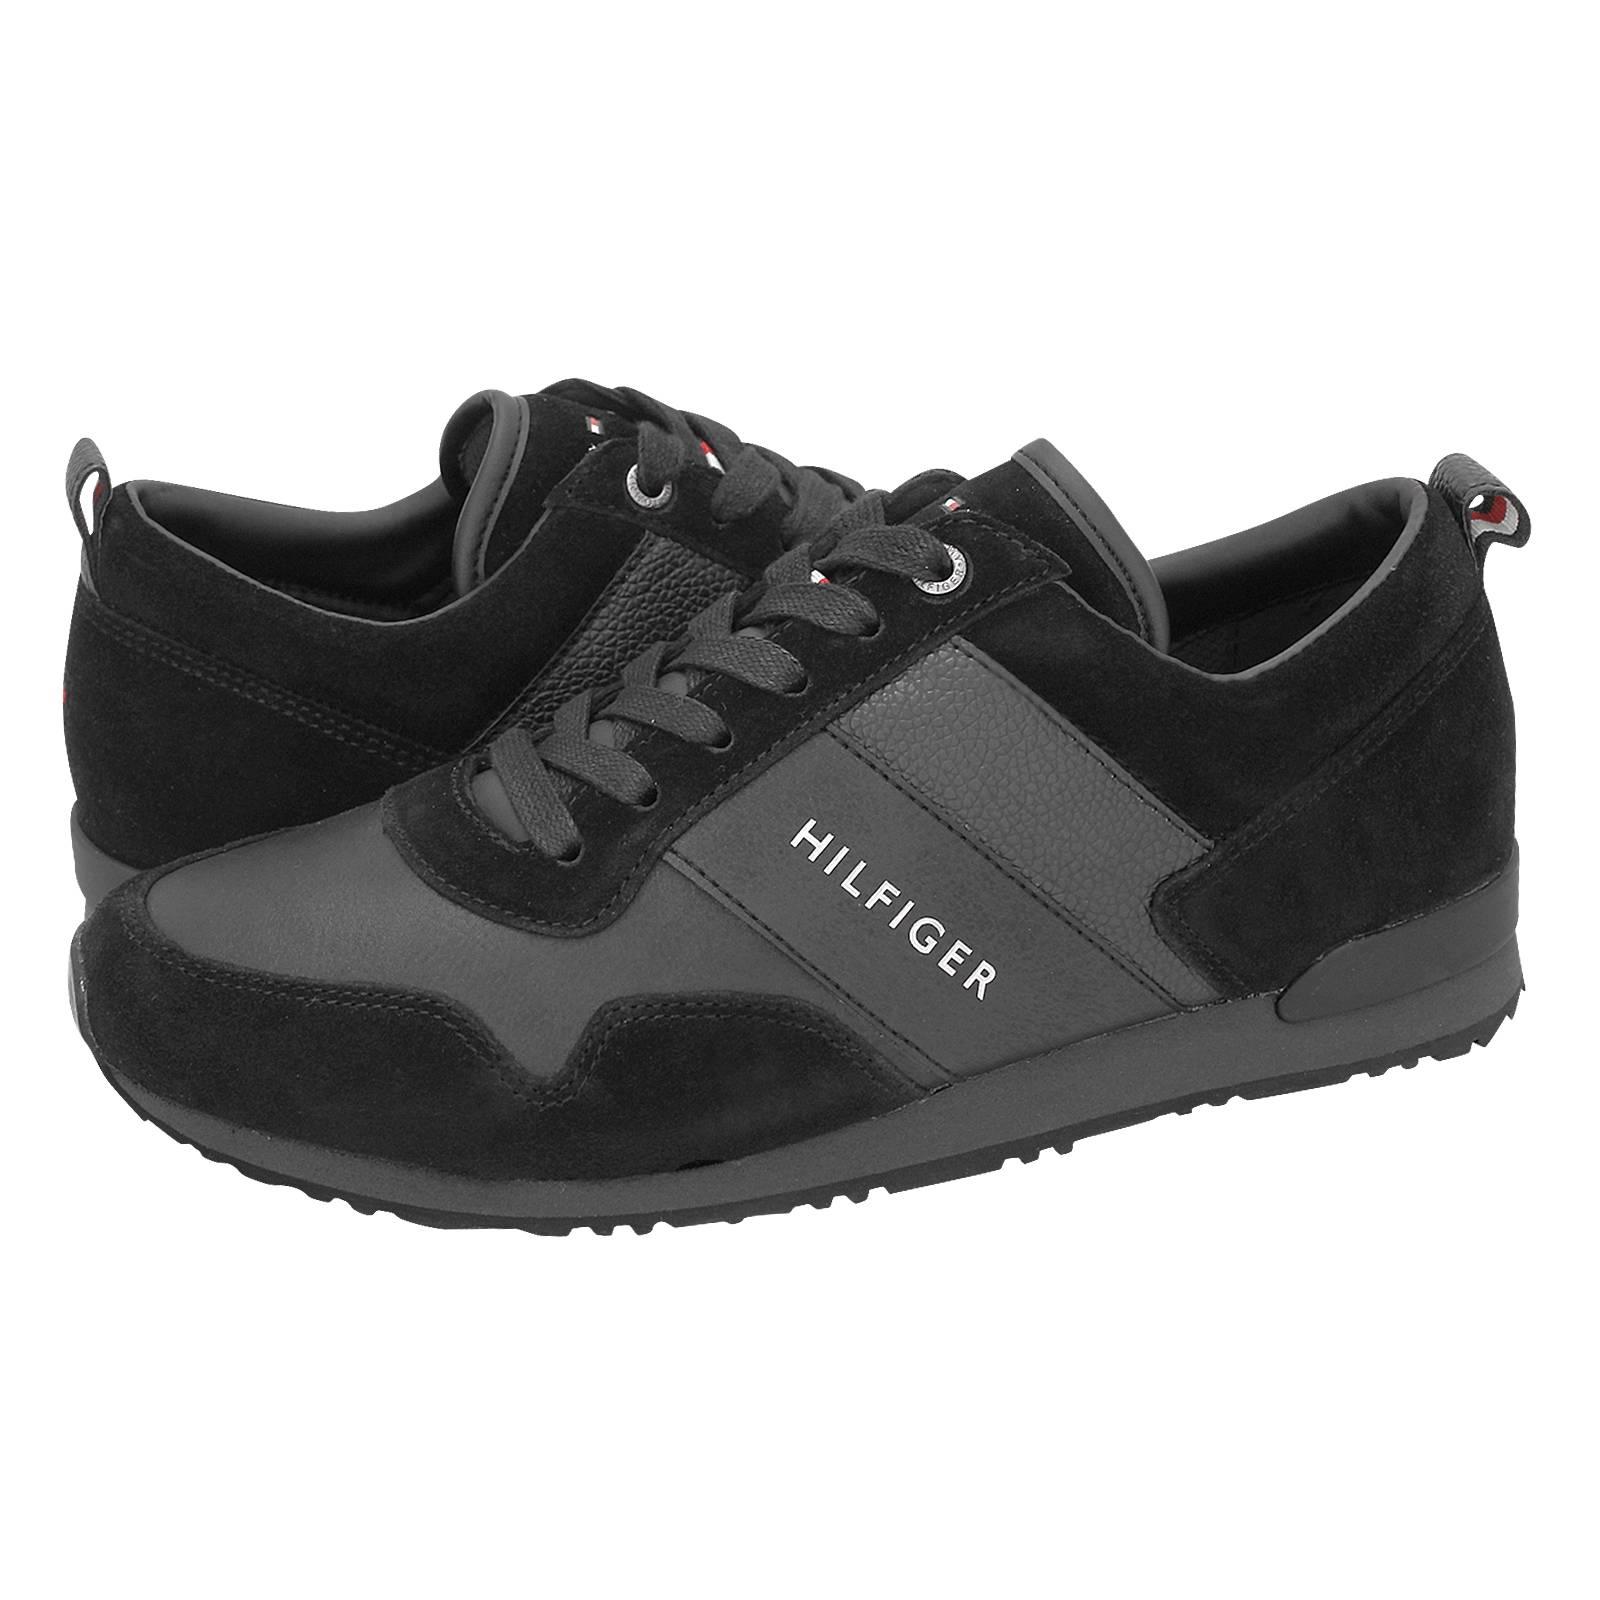 Maxwell 11c1 tommy hilfiger mens casual shoes made of synthetic tommy hilfiger maxwell 11c1 casual shoes publicscrutiny Images